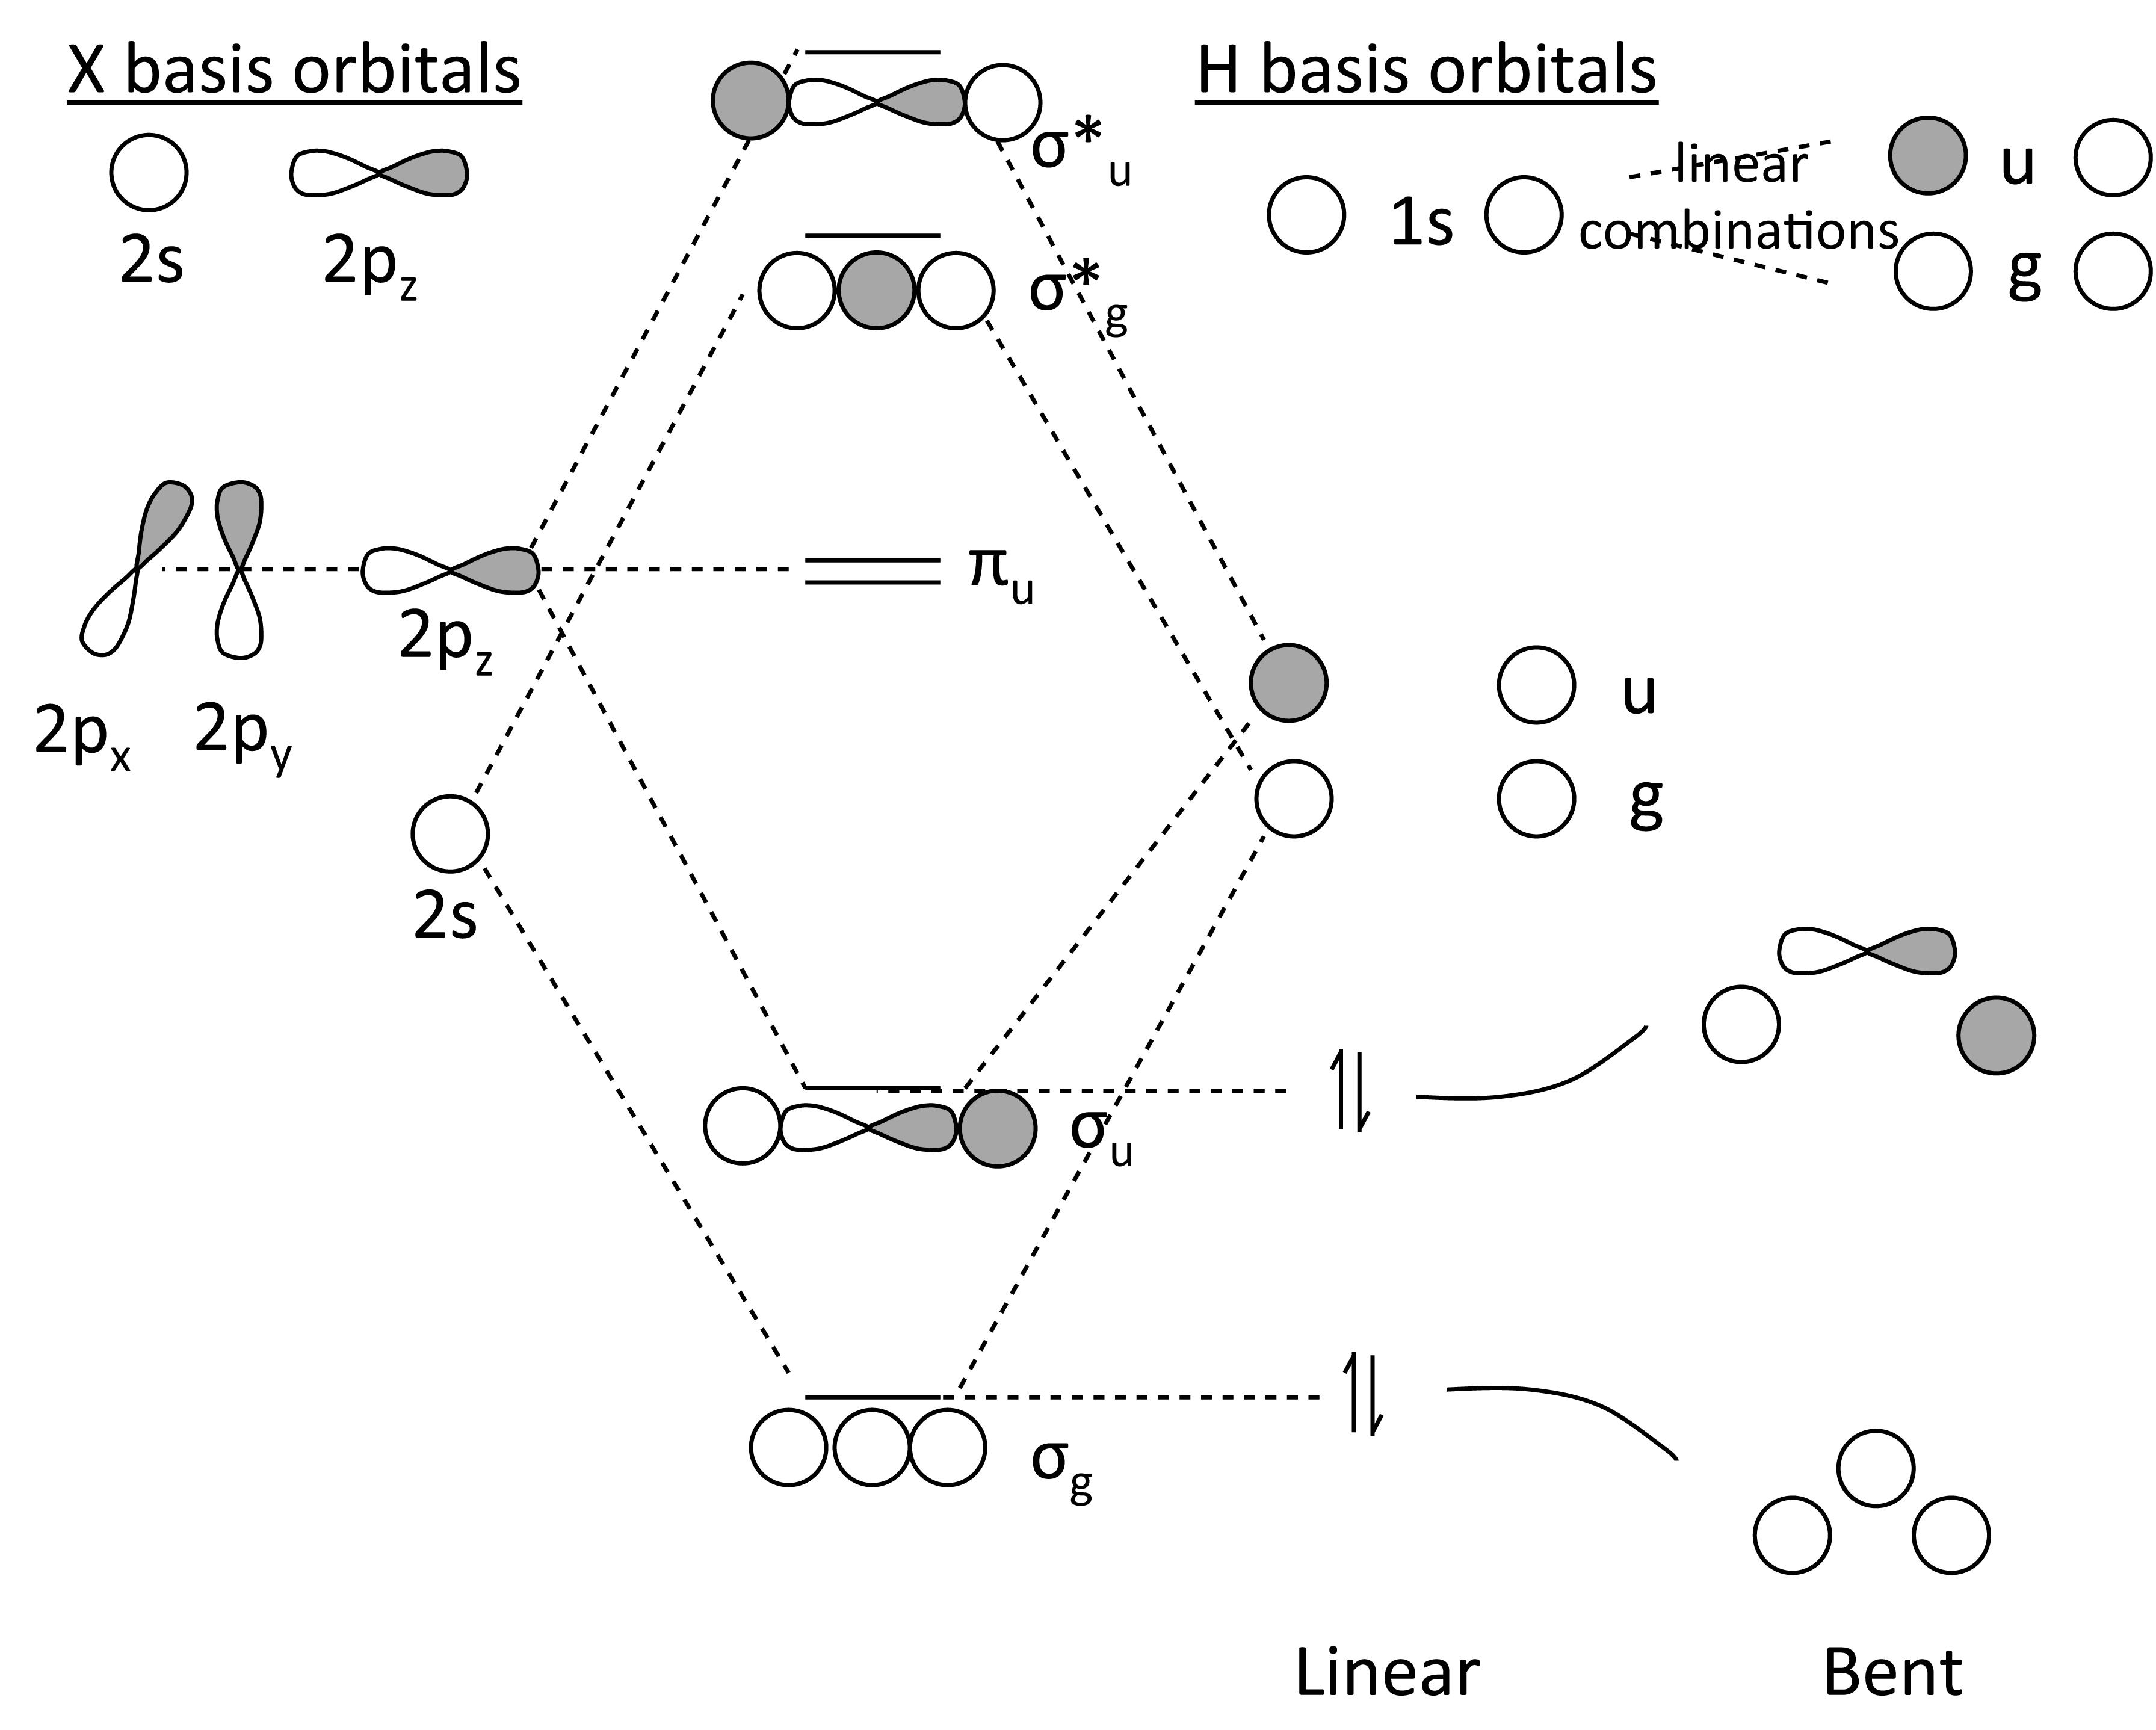 Filexh2 mo diagramg wikimedia commons filexh2 mo diagramg pooptronica Gallery